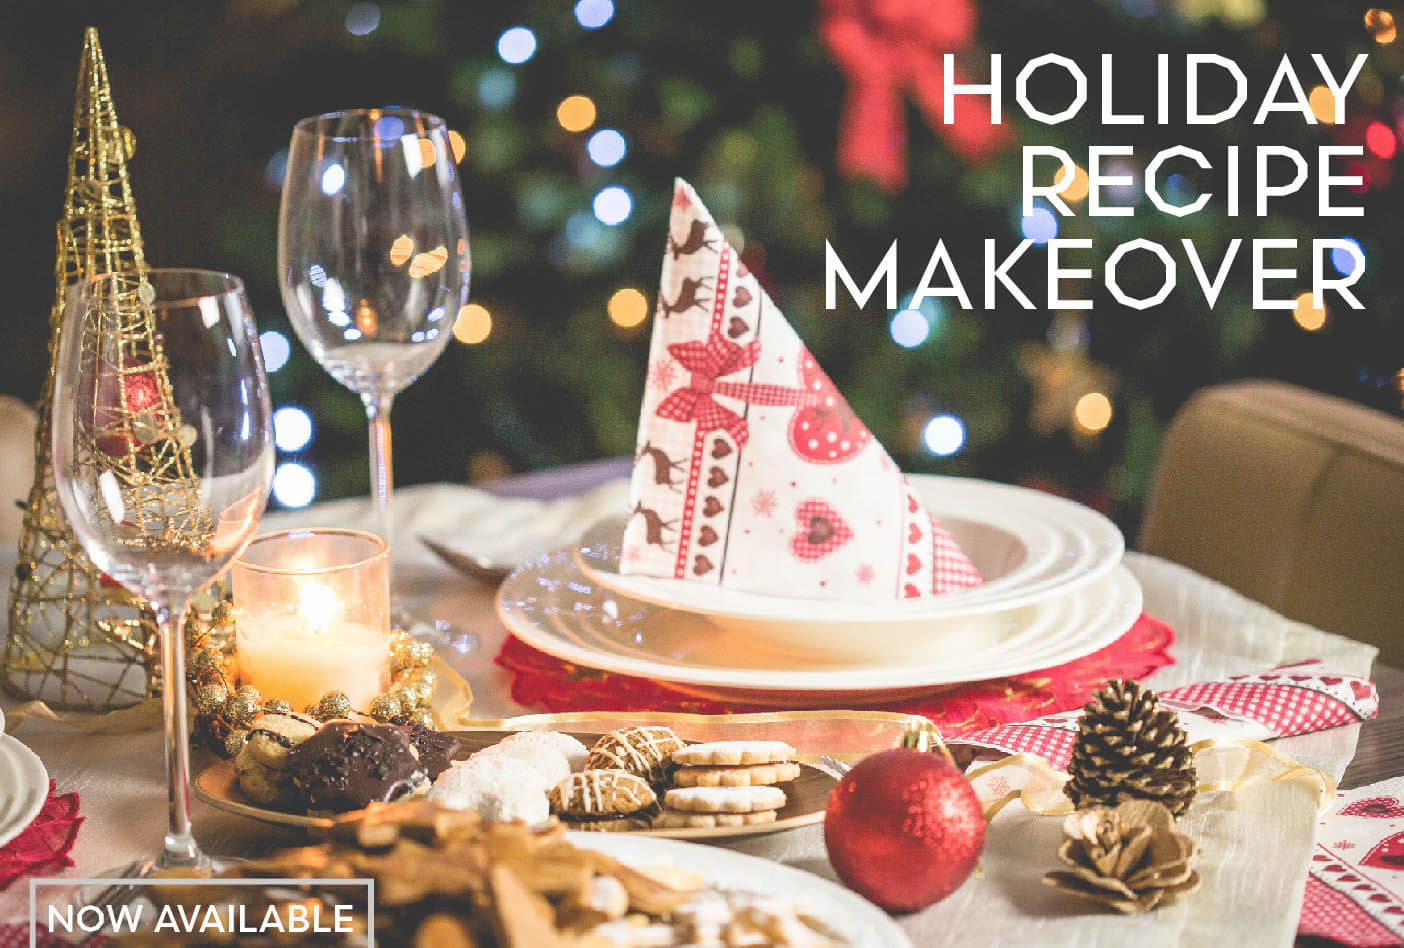 Holiday Recipe Makeover